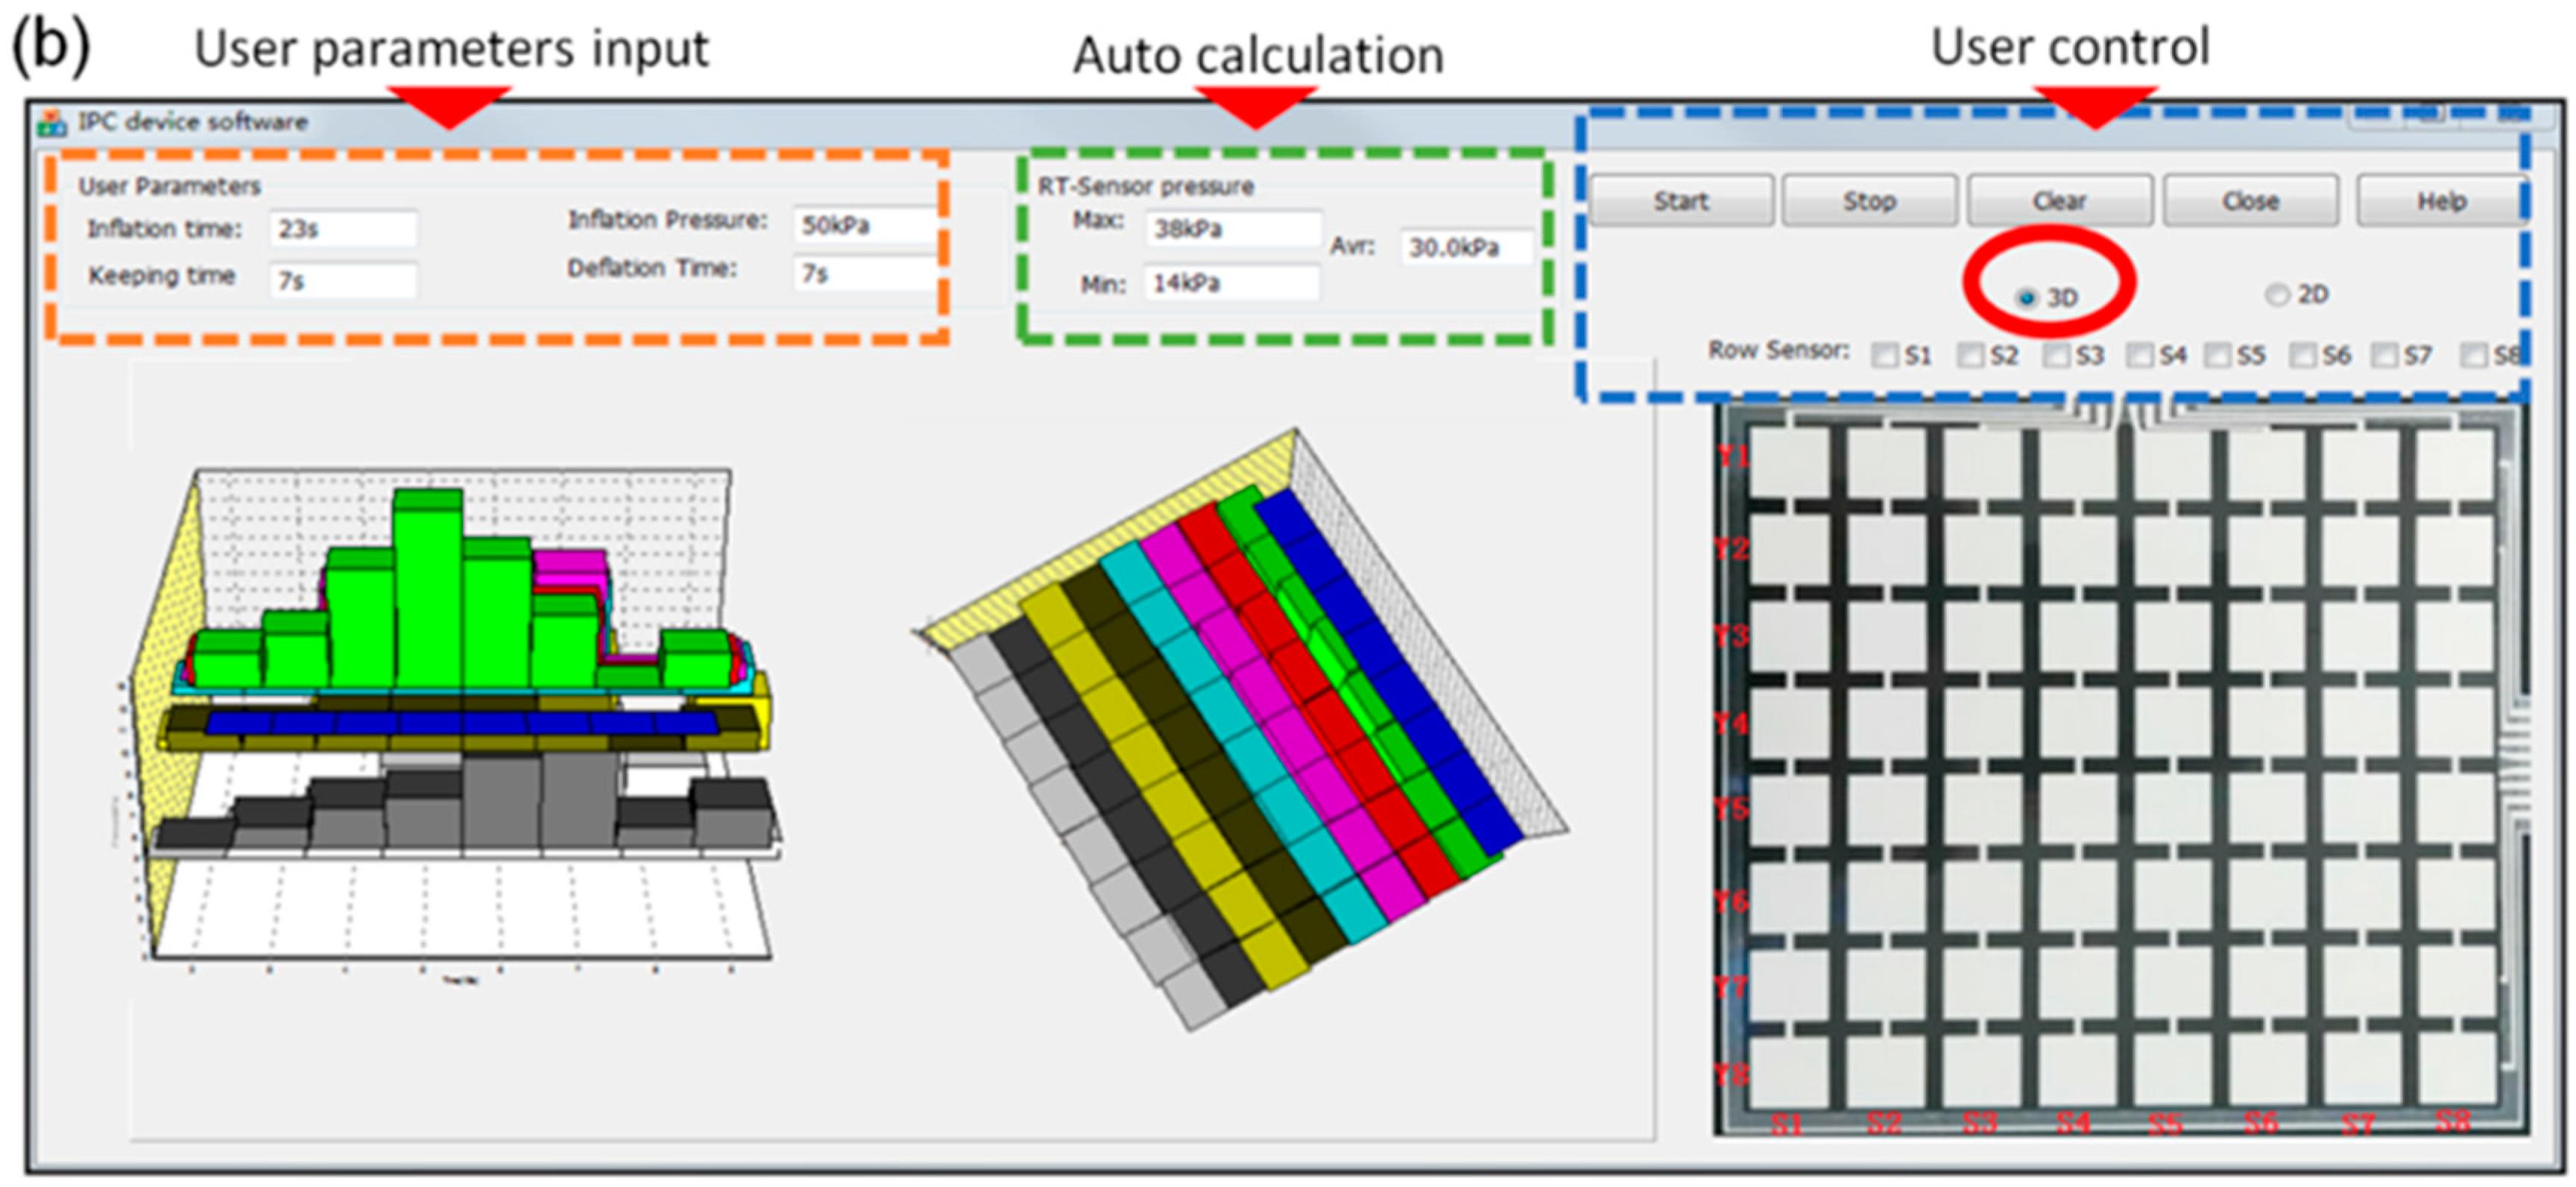 Sensors | Free Full-Text | Dynamic Interface Pressure